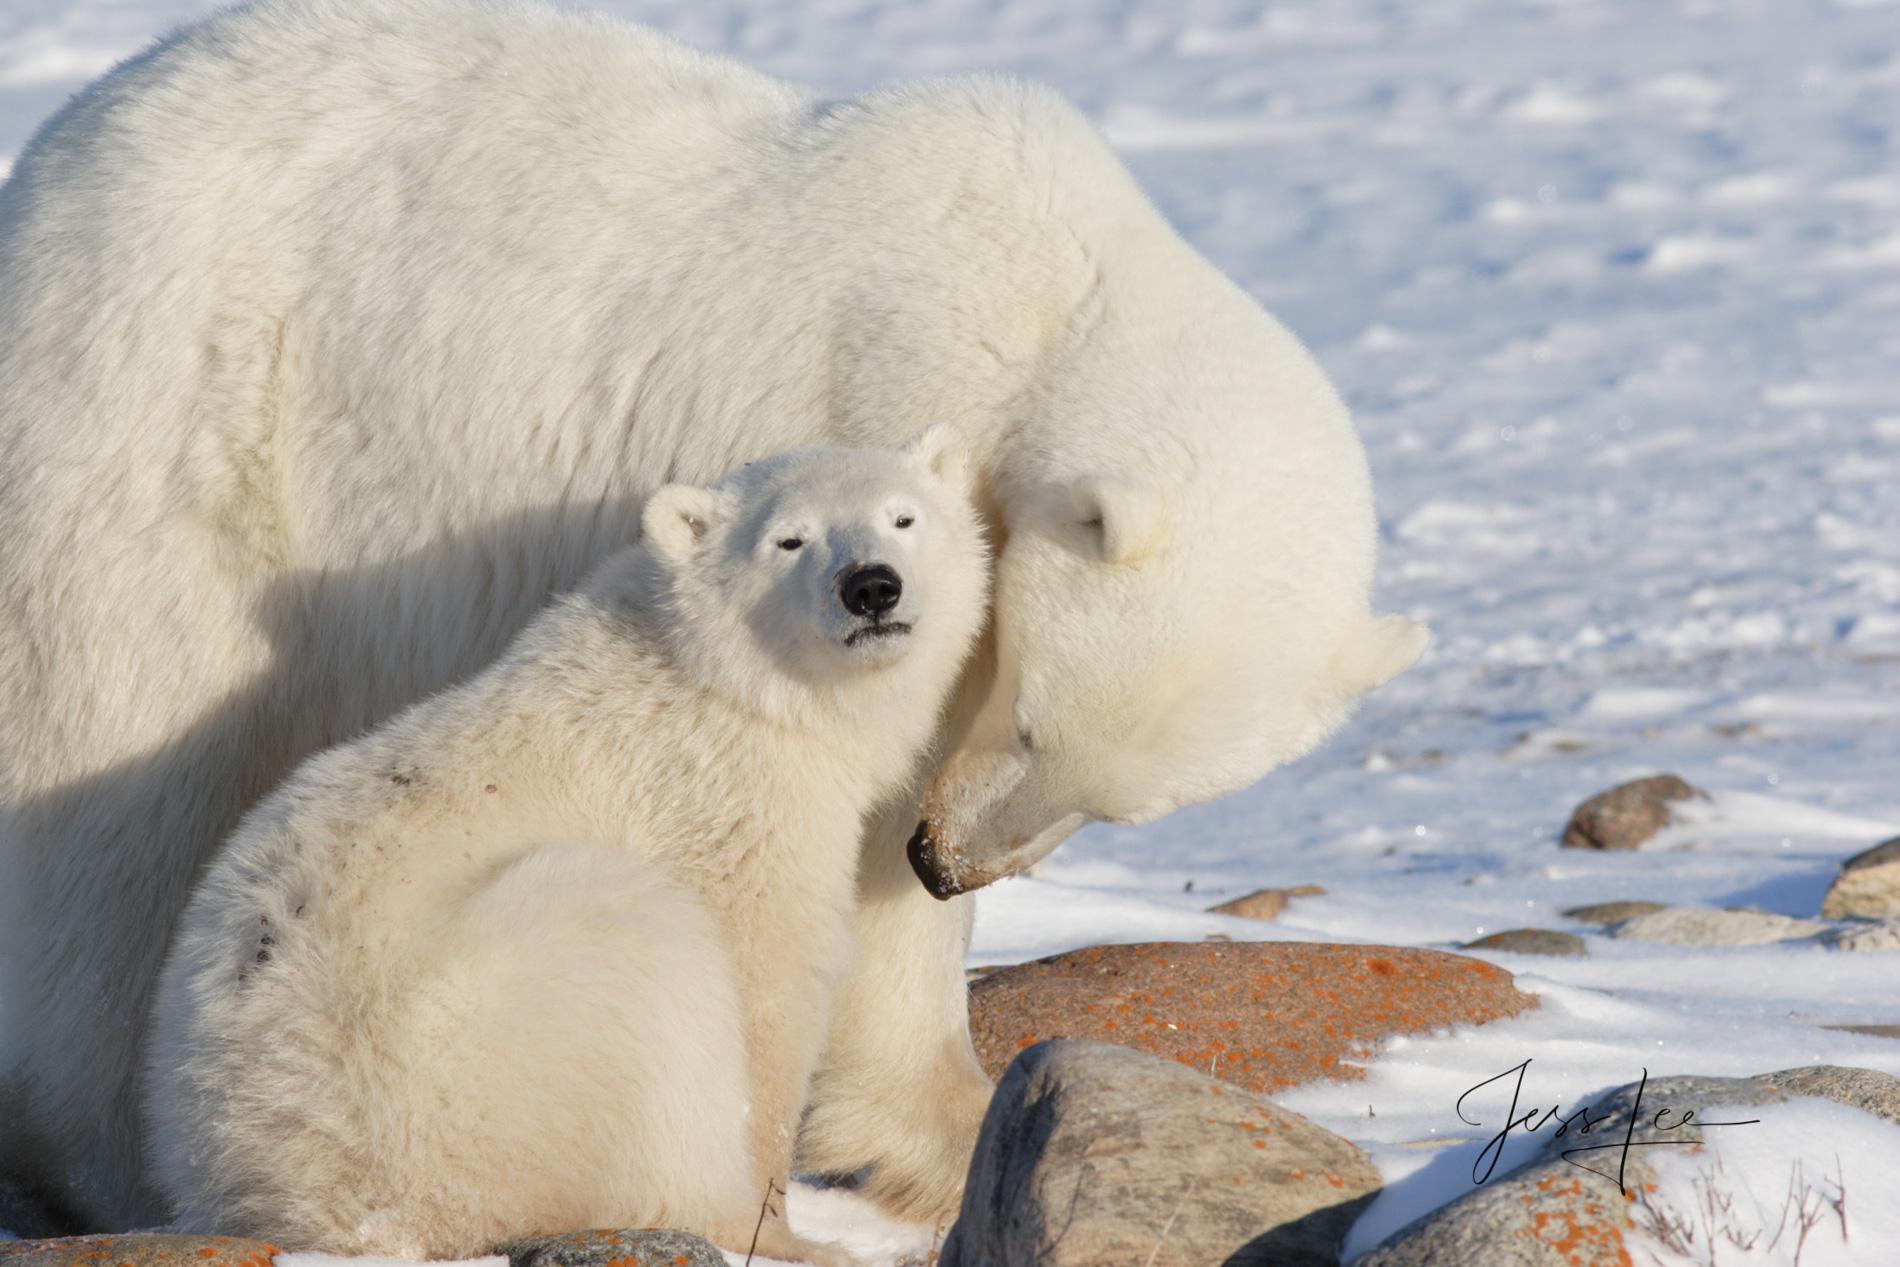 Polar bear in warming, Hudsons bay, arctic, arctic Canada, bear, bears, churchill, mammal, Manitoba, marine, polar, polar bear, polar bears, photo